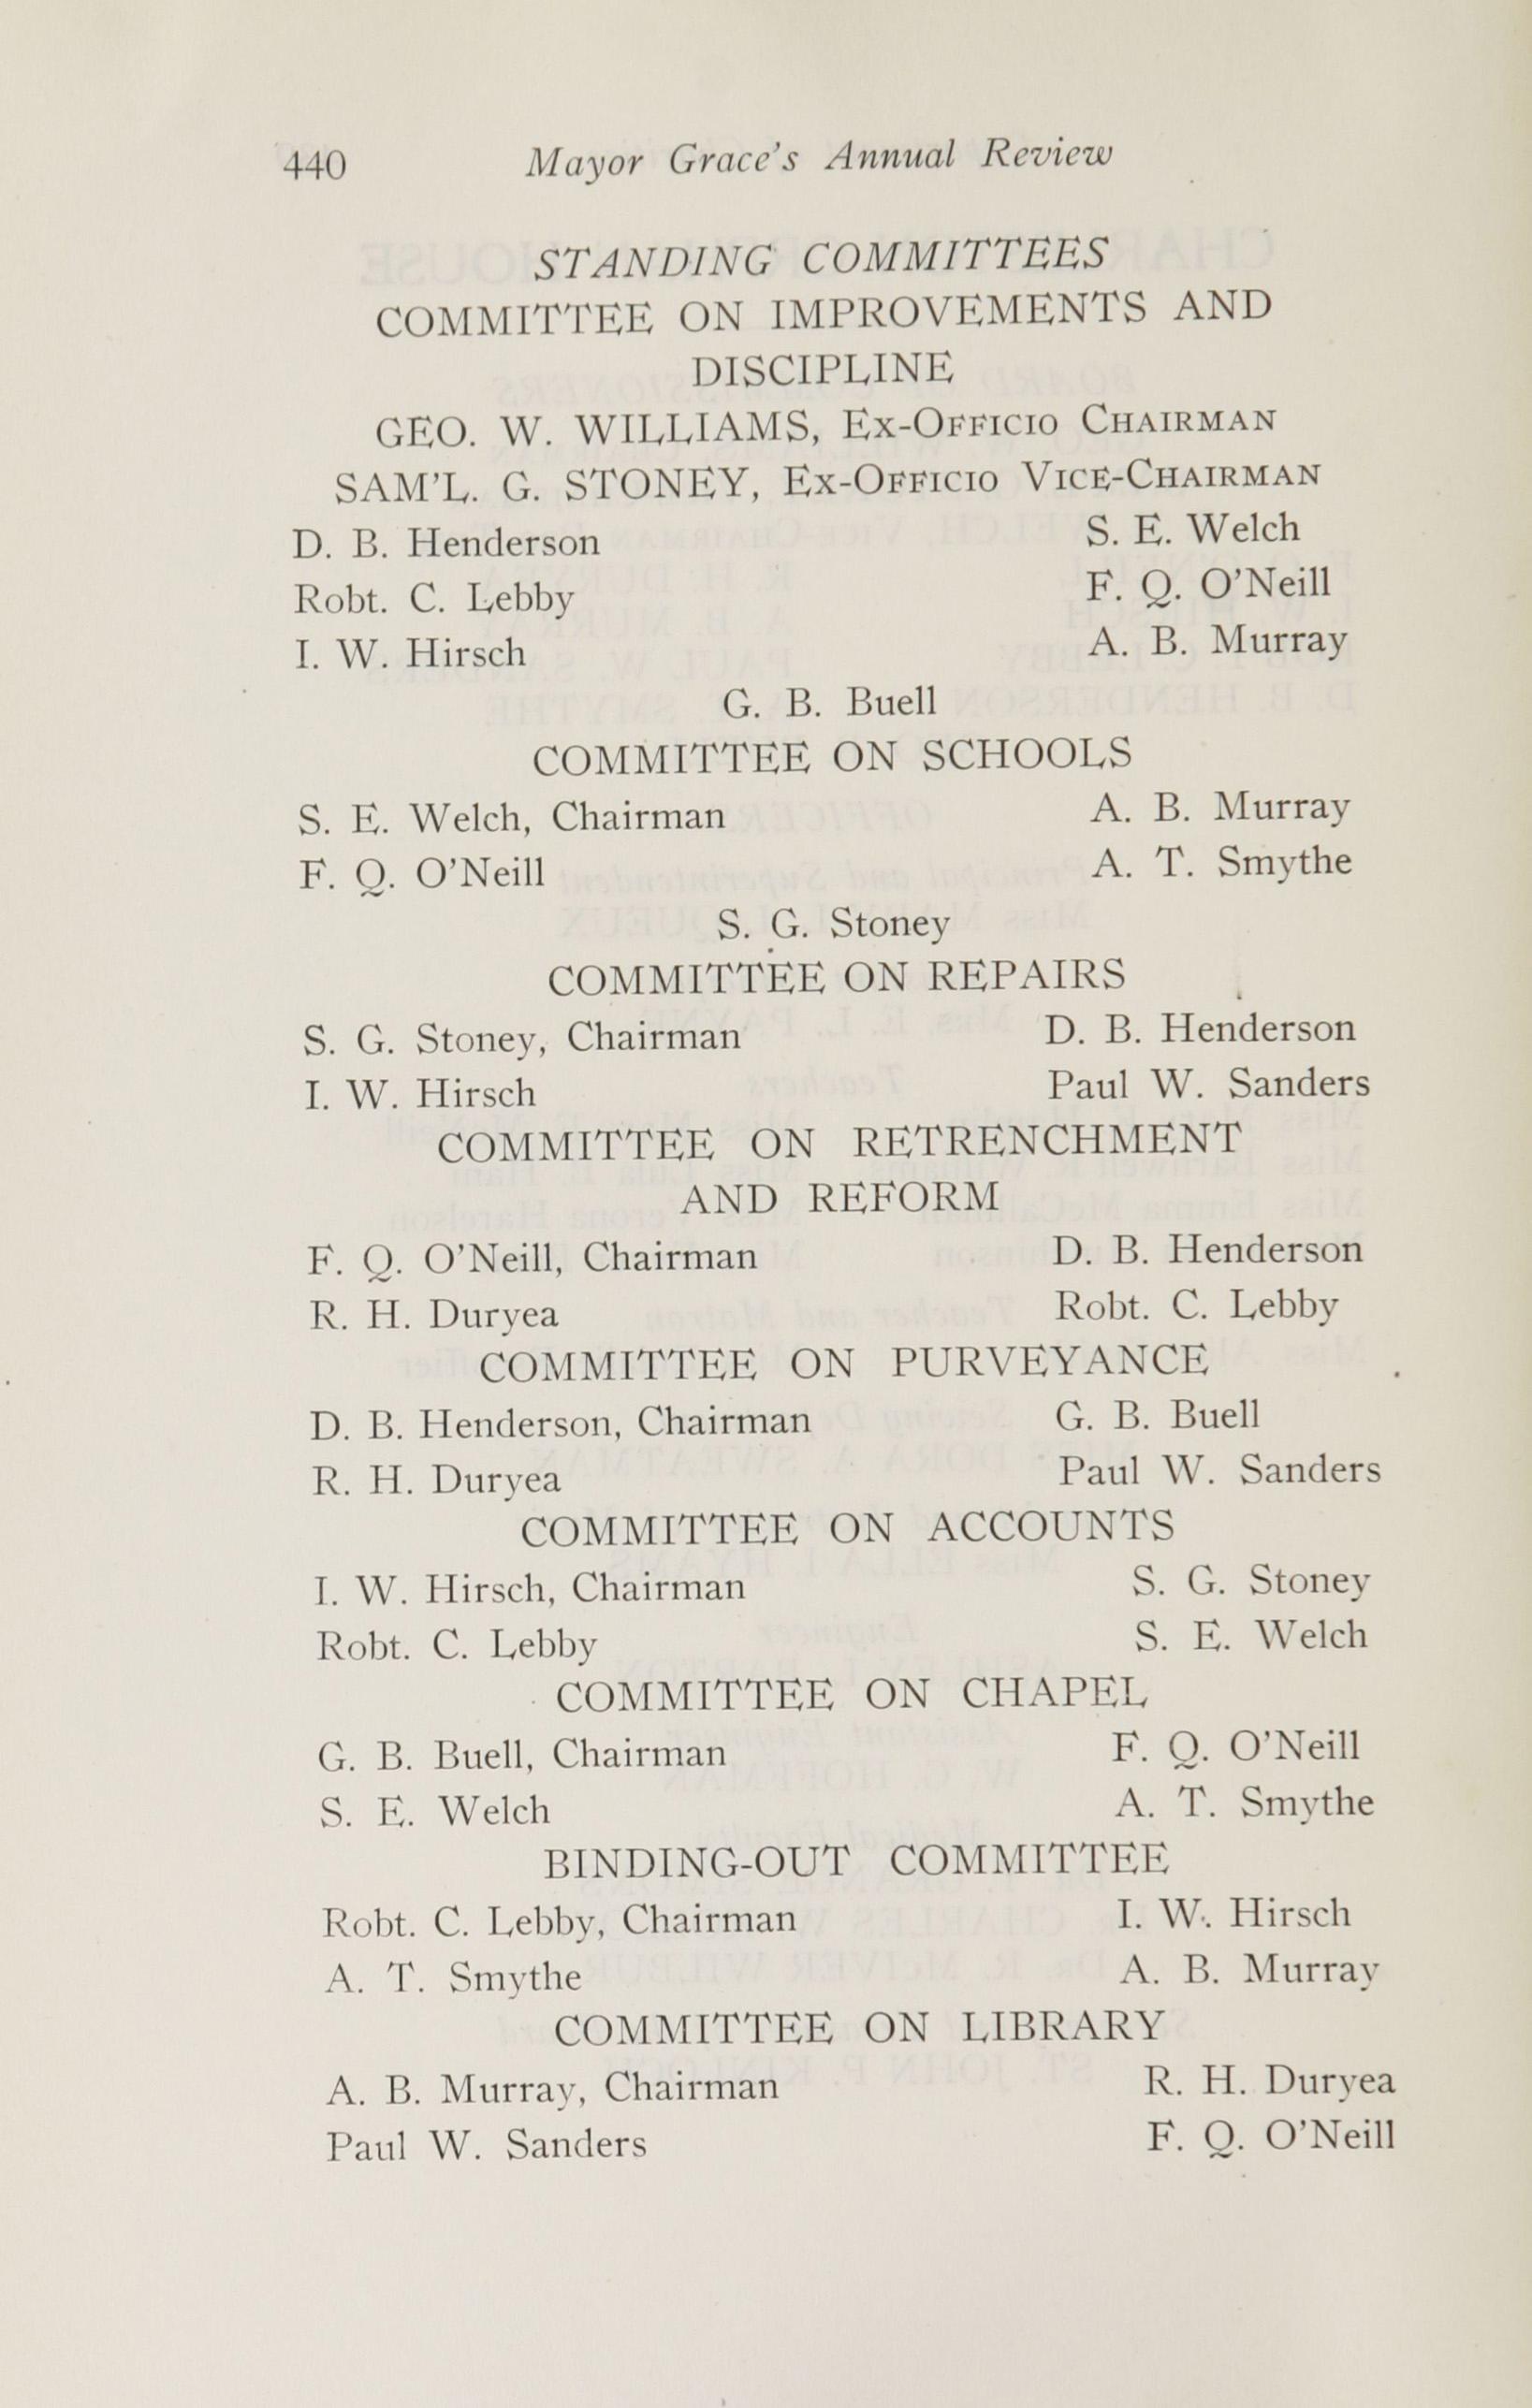 Charleston Yearbook, 1920, page 440